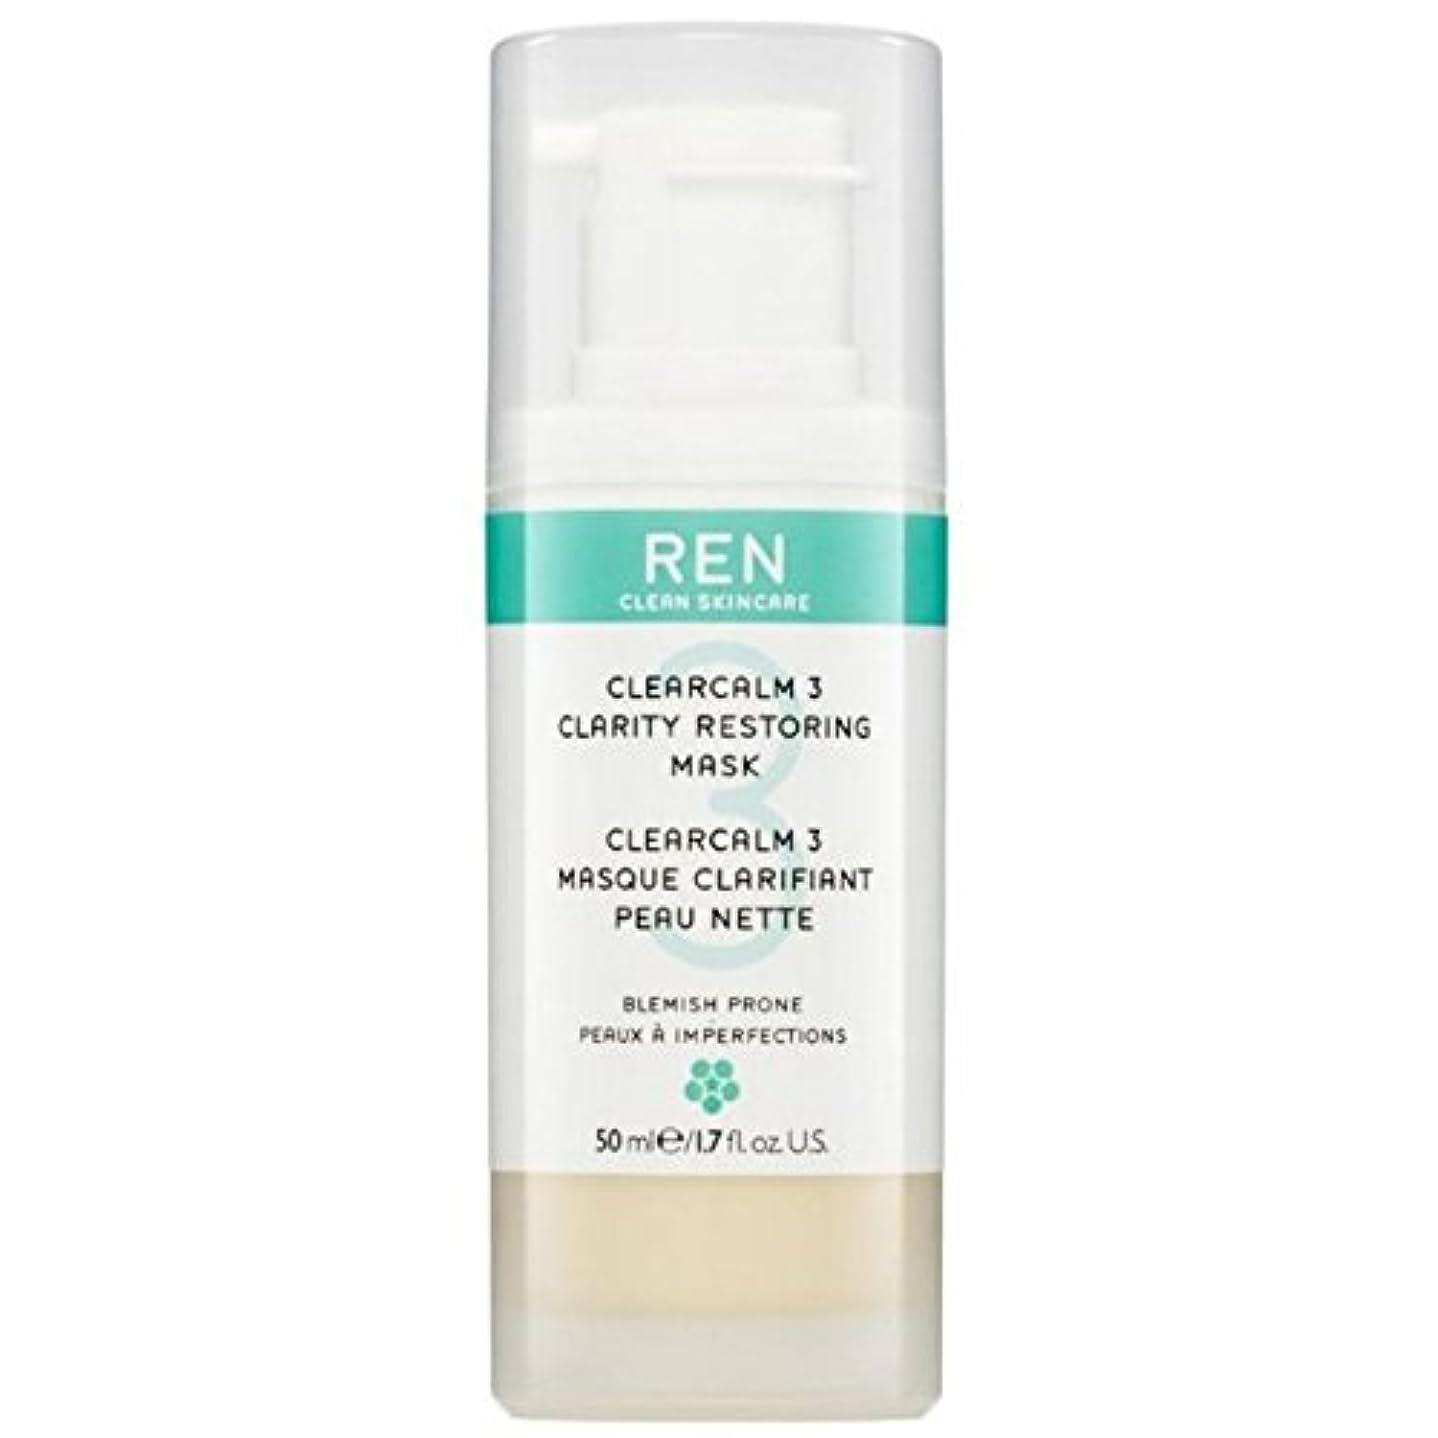 退屈外科医選挙REN Clearcalm 3 Clarity Restoring Mask - 3明快復元マスク [並行輸入品]